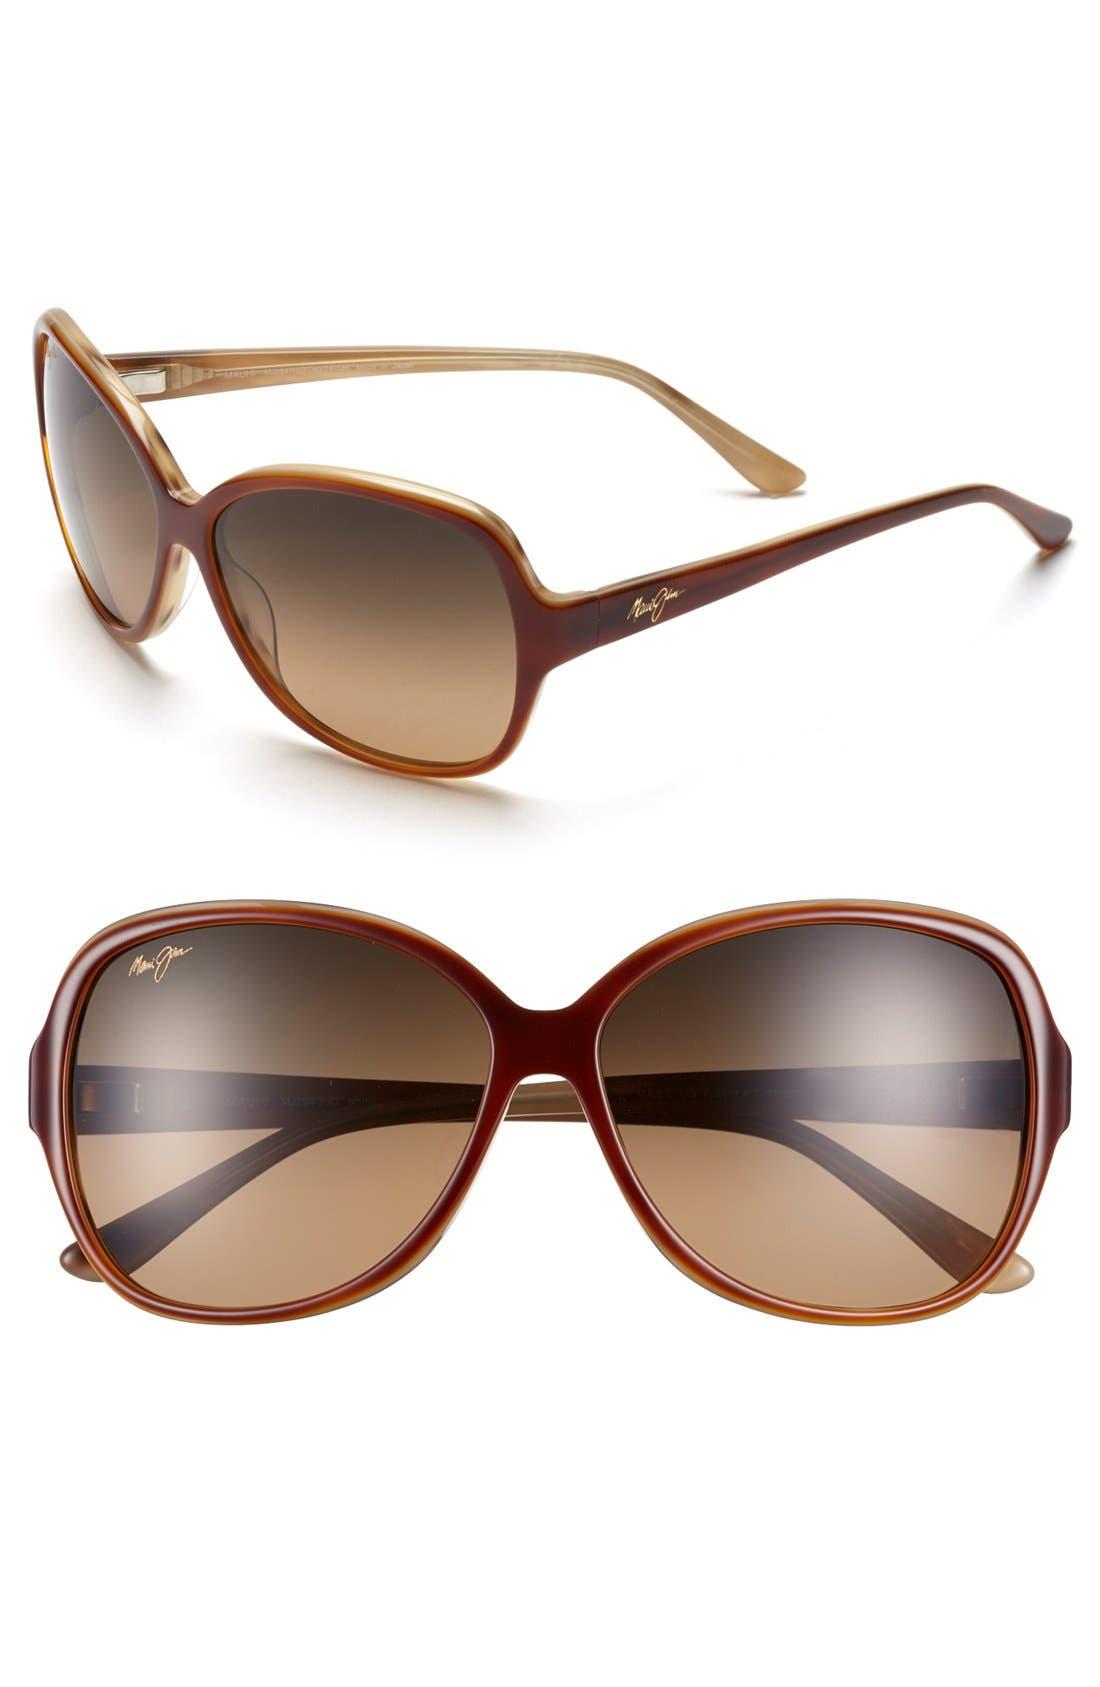 Maui Jim Maile 60Mm Polarizedplus Sunglasses - Tortoise/ Ivory